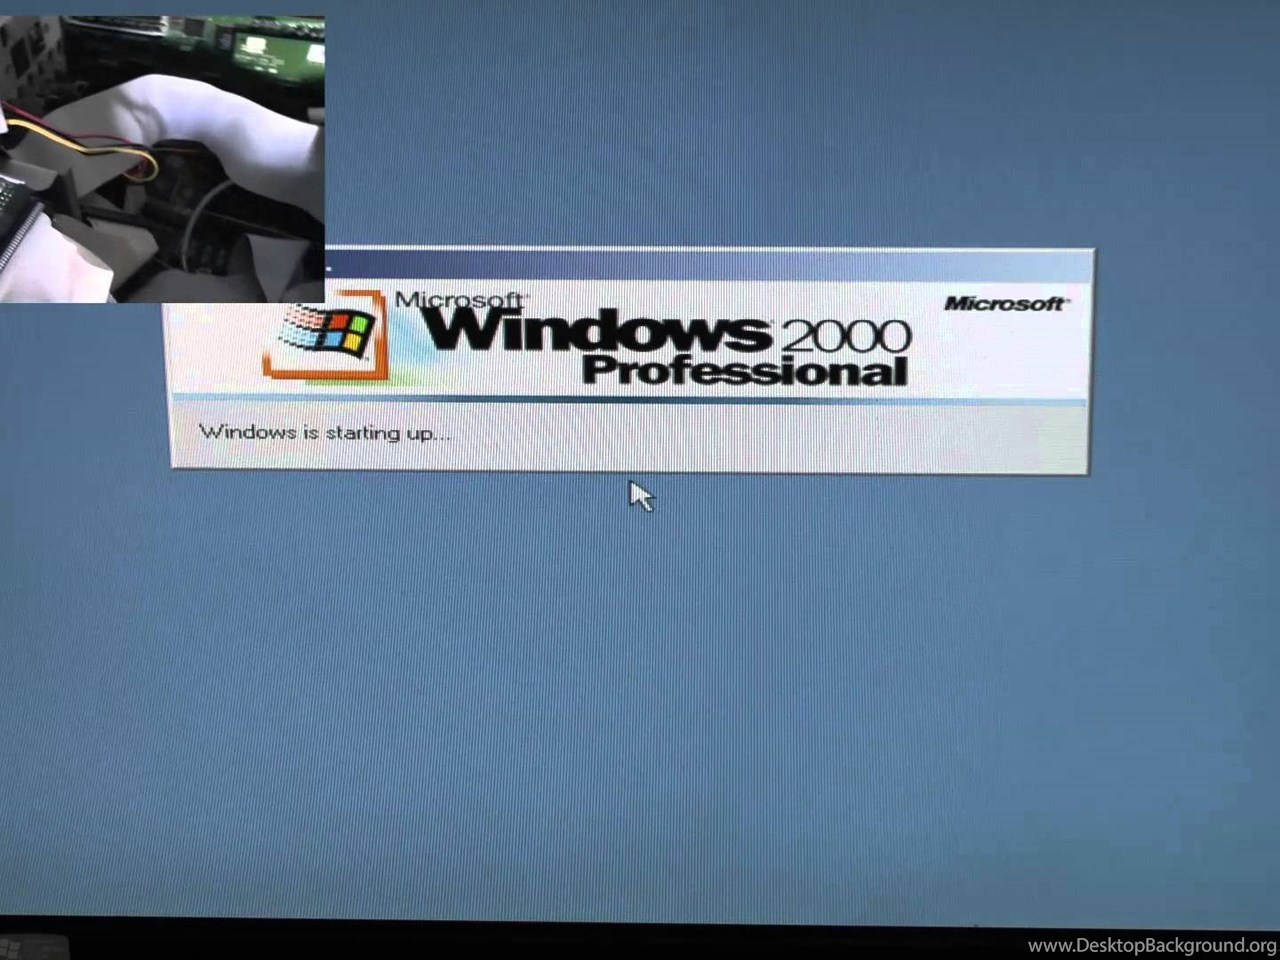 Intel 486 DX/2 66Mhz Running Windows 2000 Professional YouTube